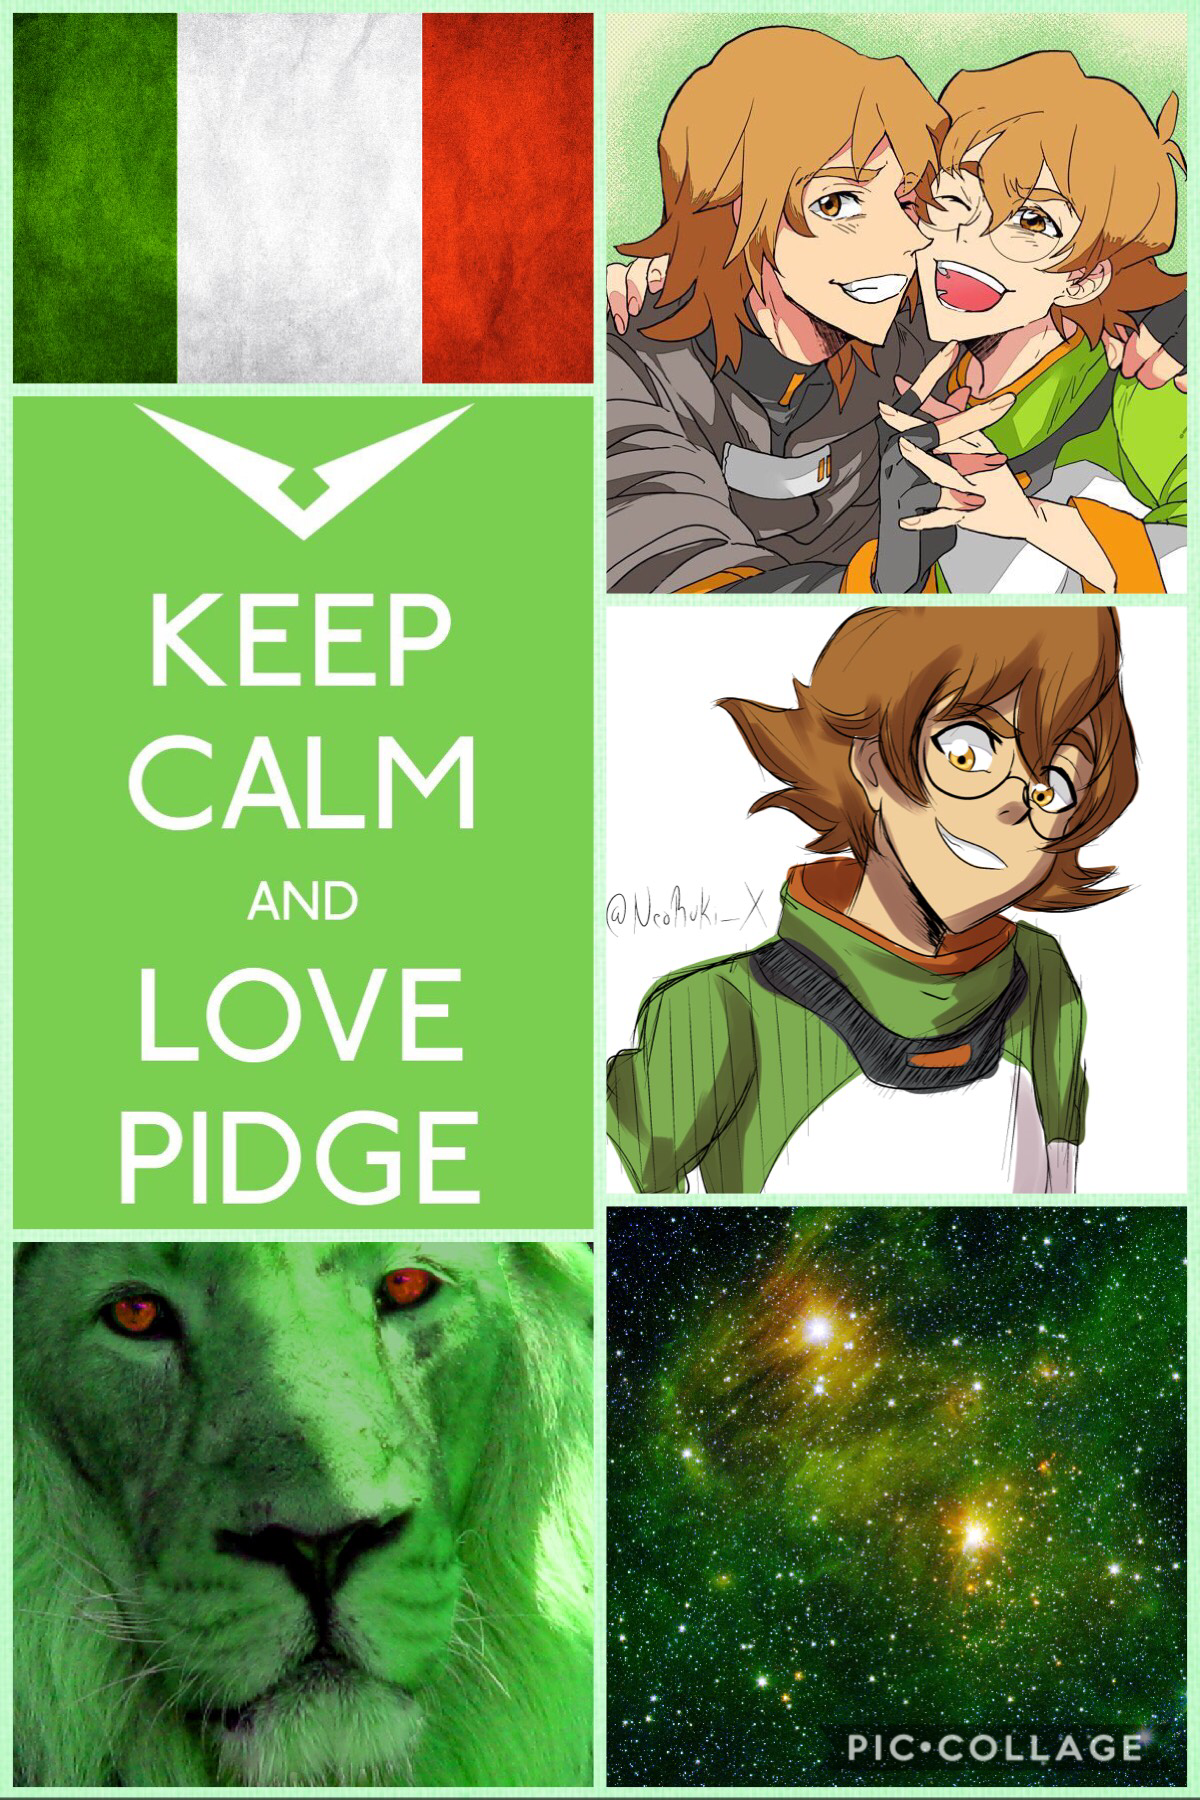 Pidge Holt, Paladin of the Green Lion